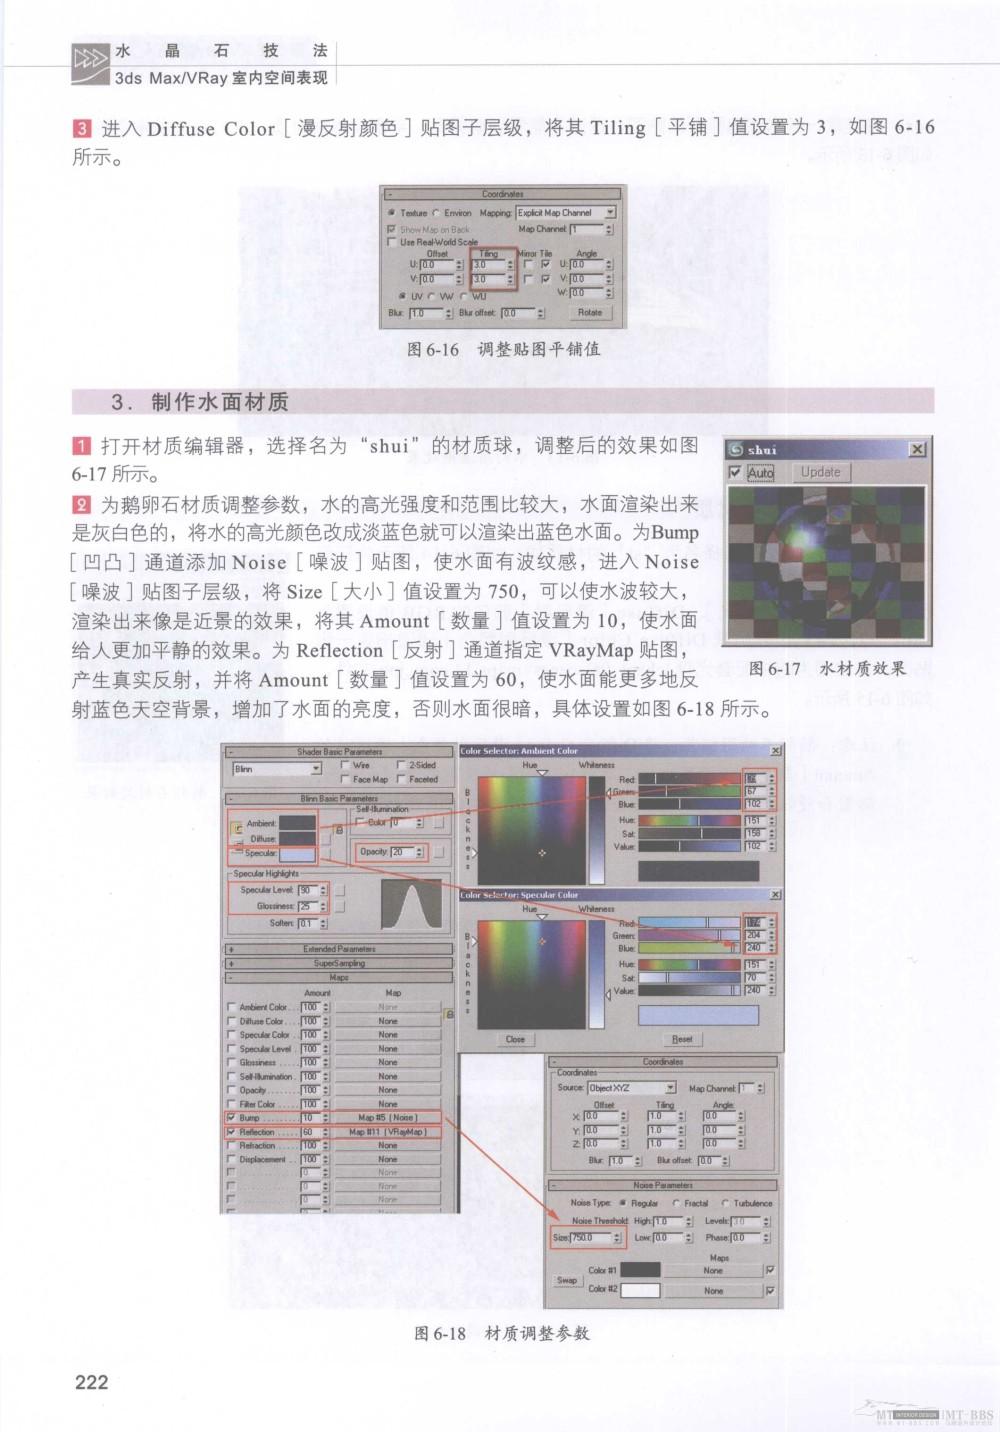 水晶石技法-3ds_Max&VRay室内空间表现_水晶石技法-3ds_Max&VRay室内空间表现_页面_228.jpg